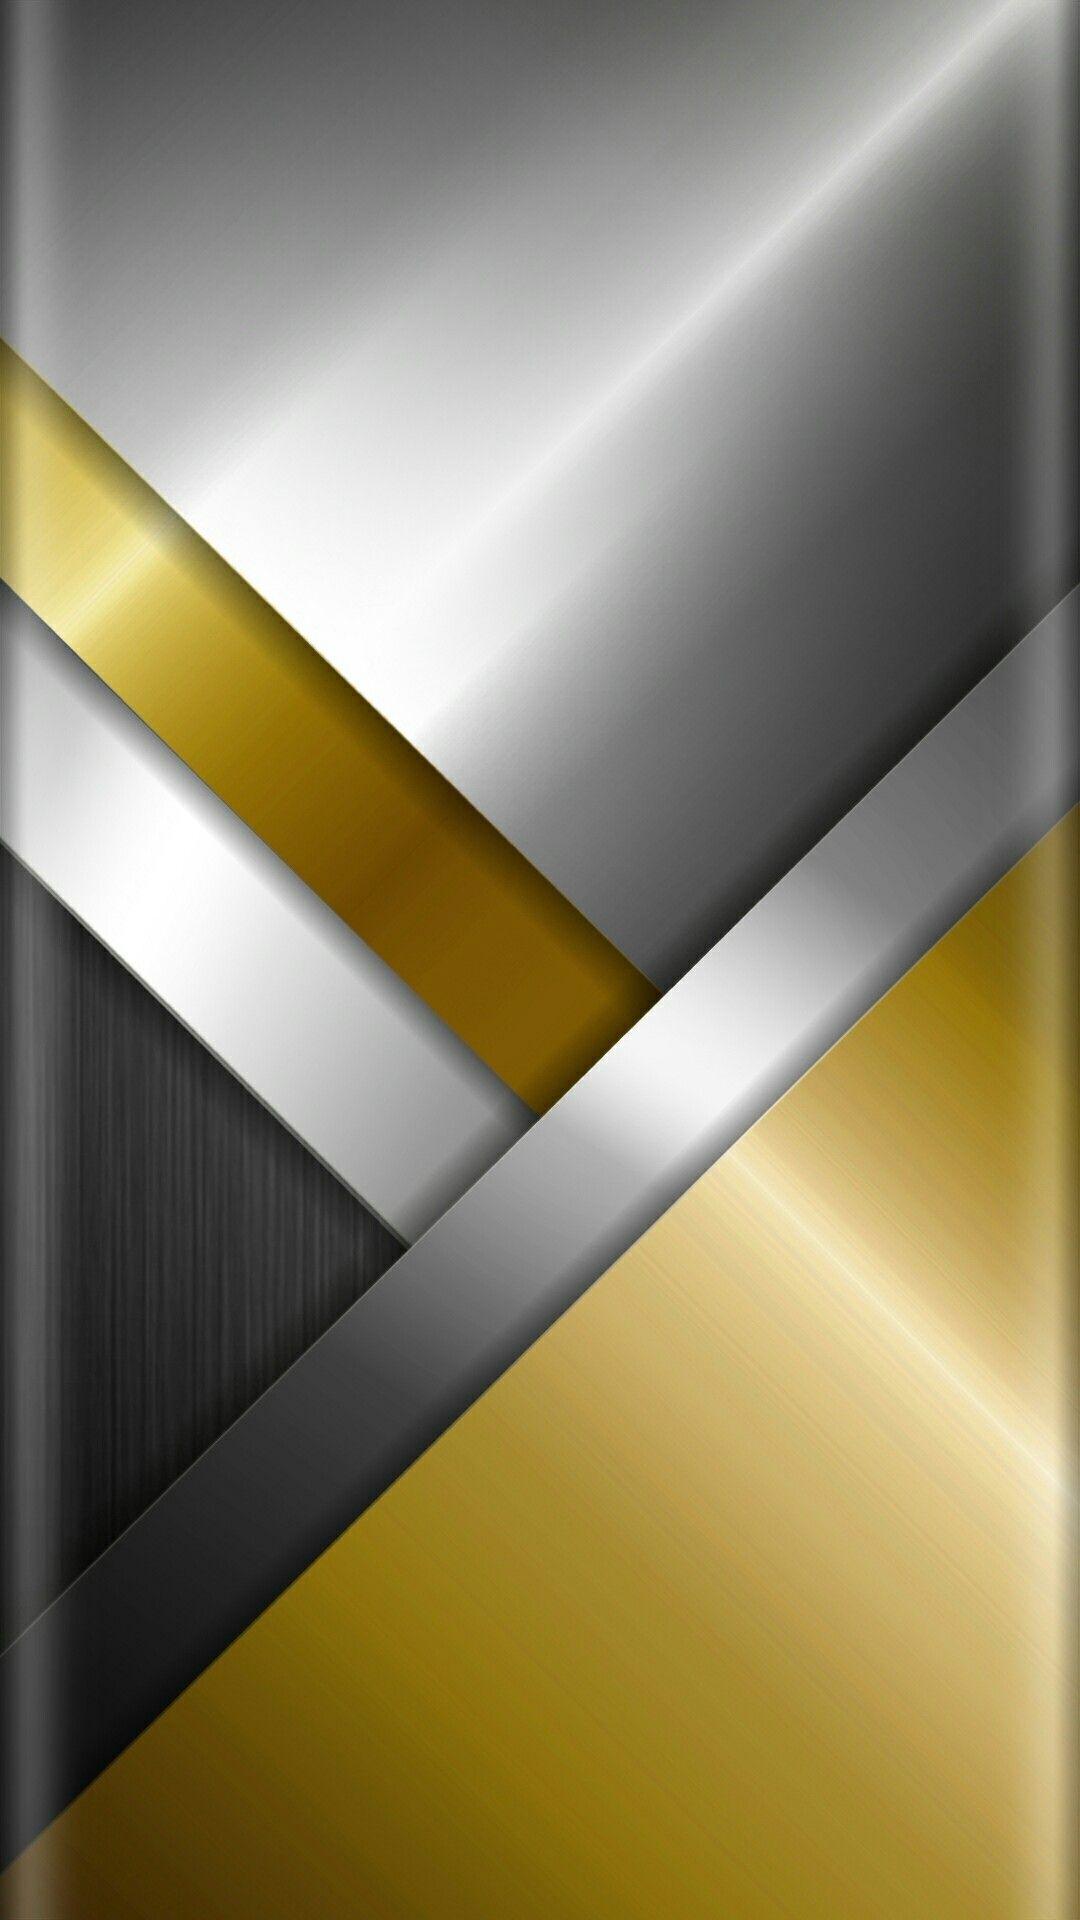 Wallpaper Gold Abstract Wallpaper, Art Deco Wallpaper, Wallpaper